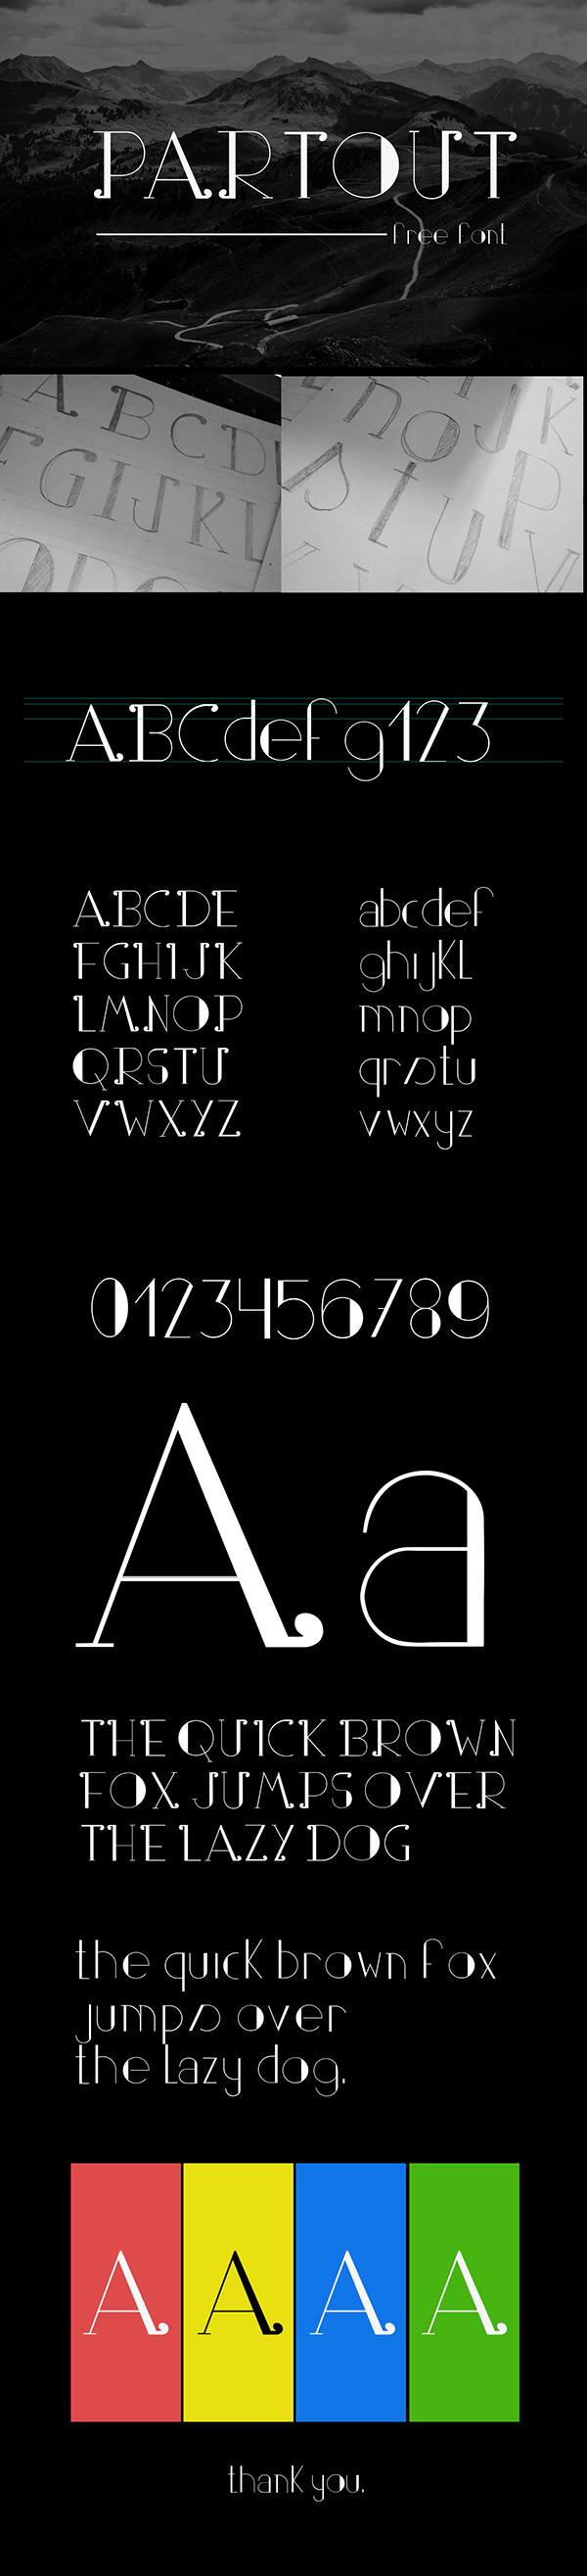 Free font,free download,type,font,free,download,tipografia,handmade